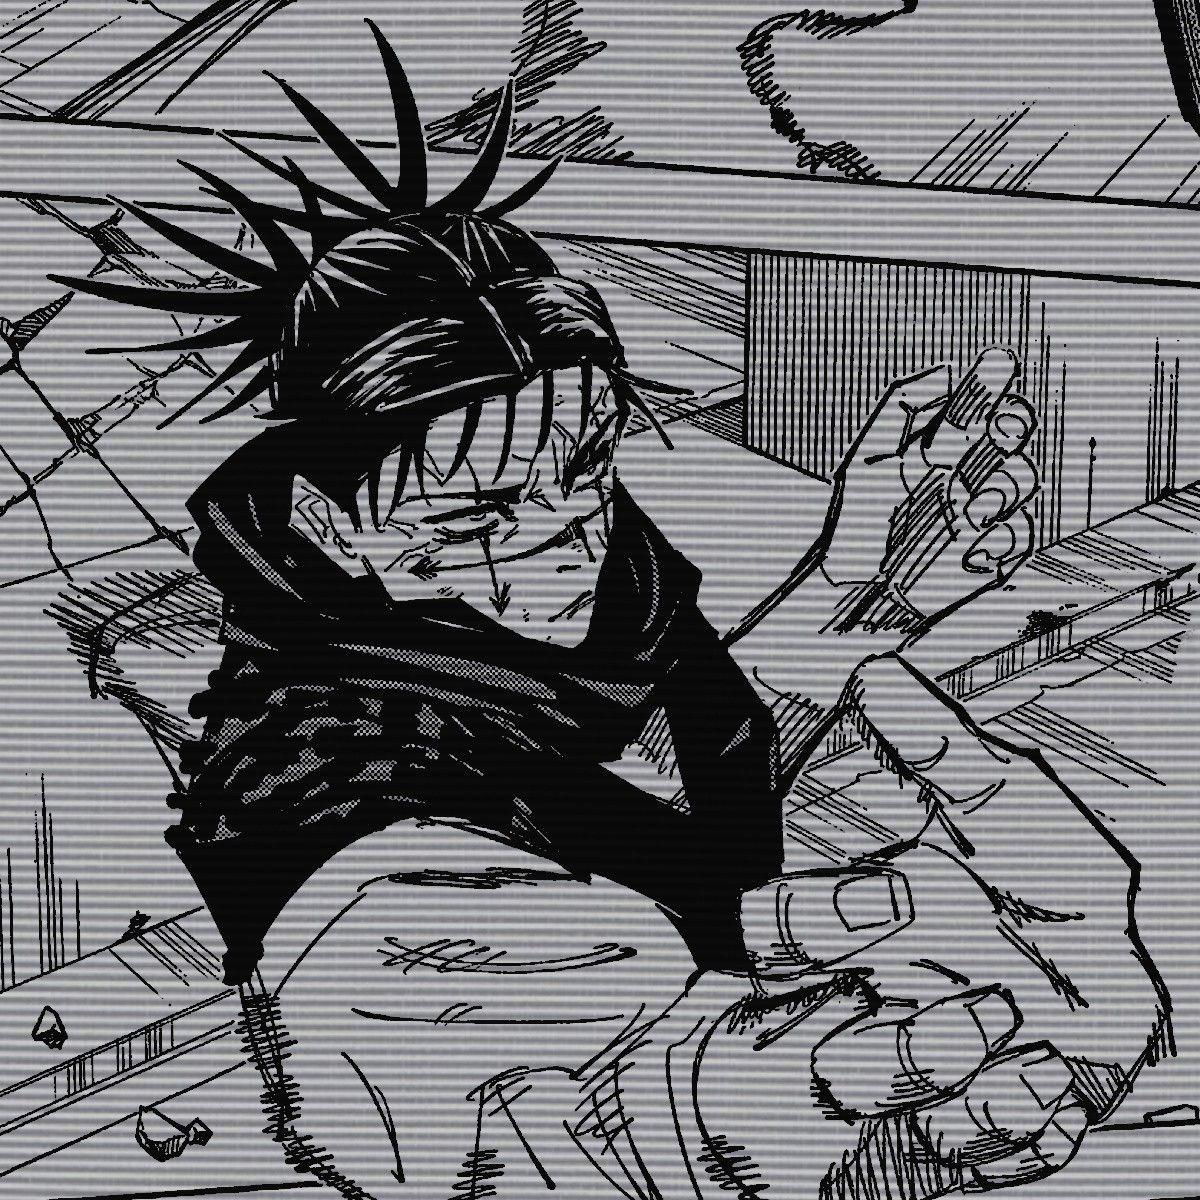 Choso Hazl X In 2021 Anime Images Anime Icons Manga